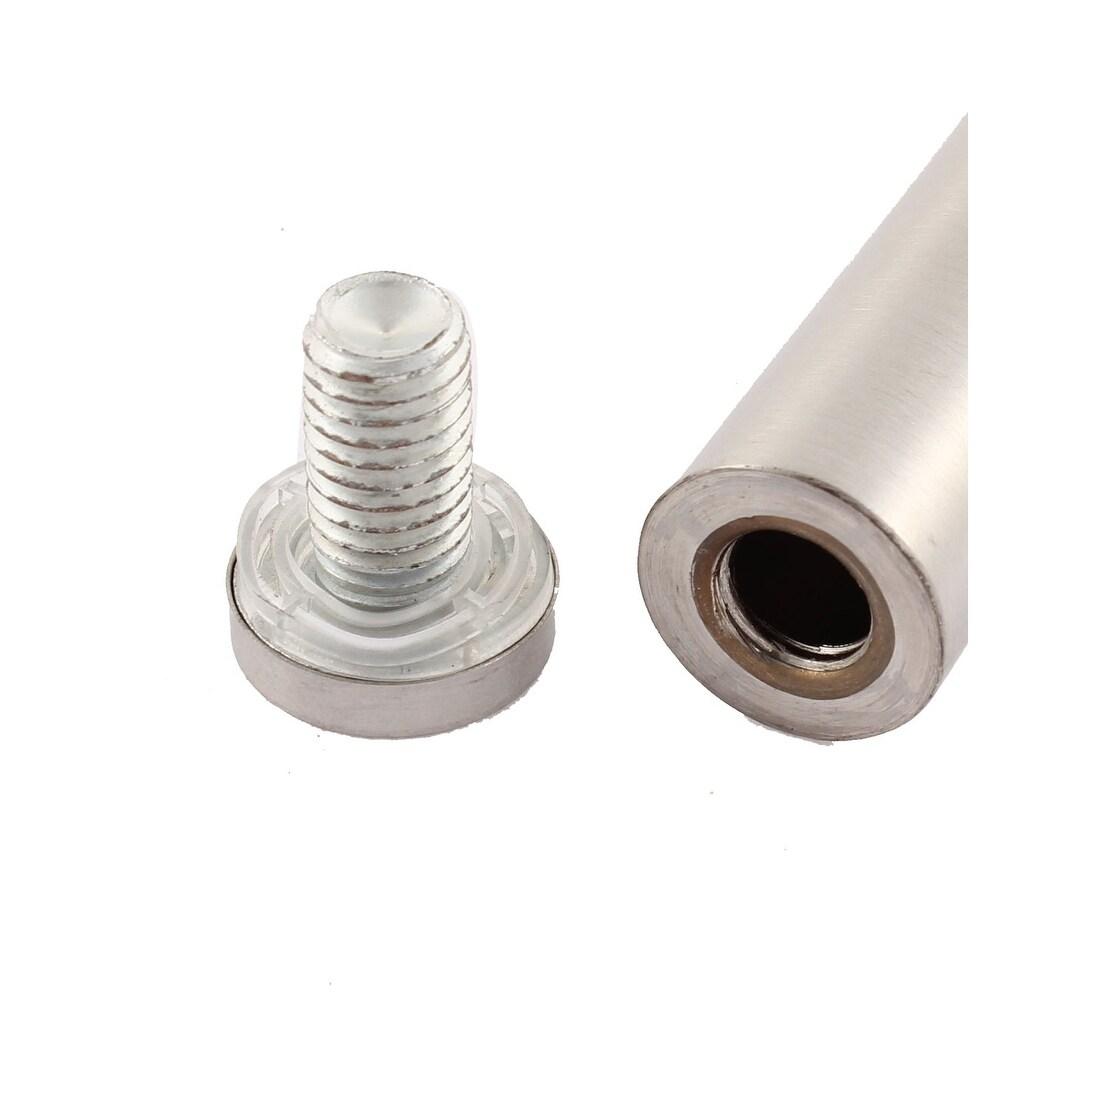 8 Pcs 19mmx100mm Billboard Advertisement Nails Screws Glass Standoff Pins Holder